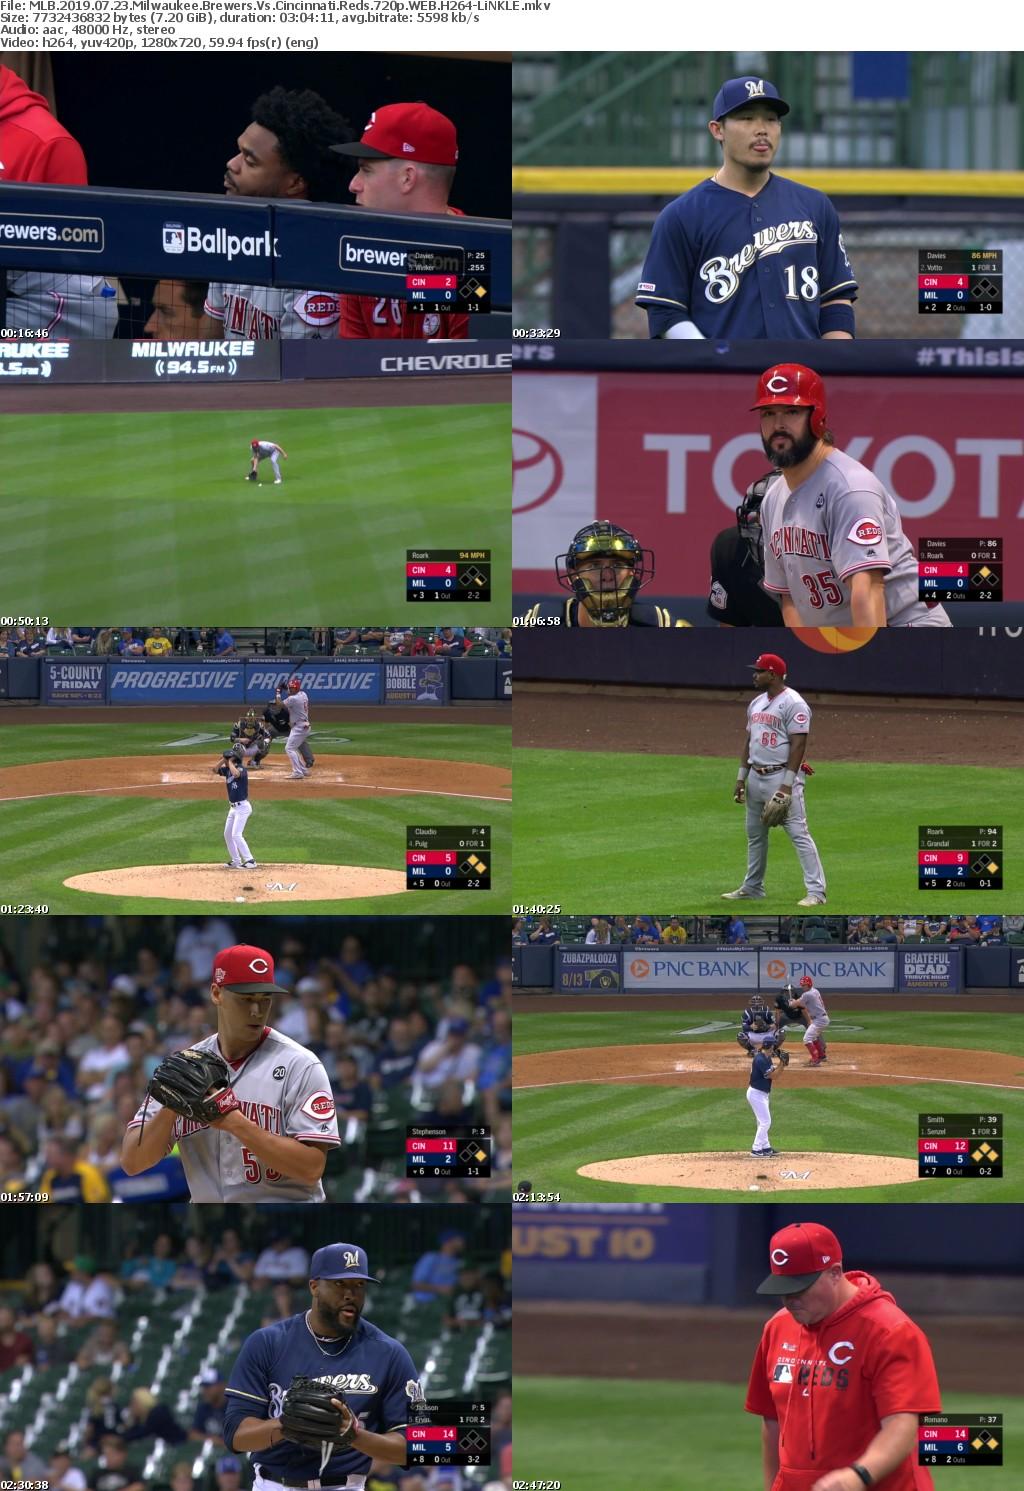 MLB 2019 07 23 Milwaukee Brewers Vs Cincinnati Reds 720p WEB H264-LiNKLE